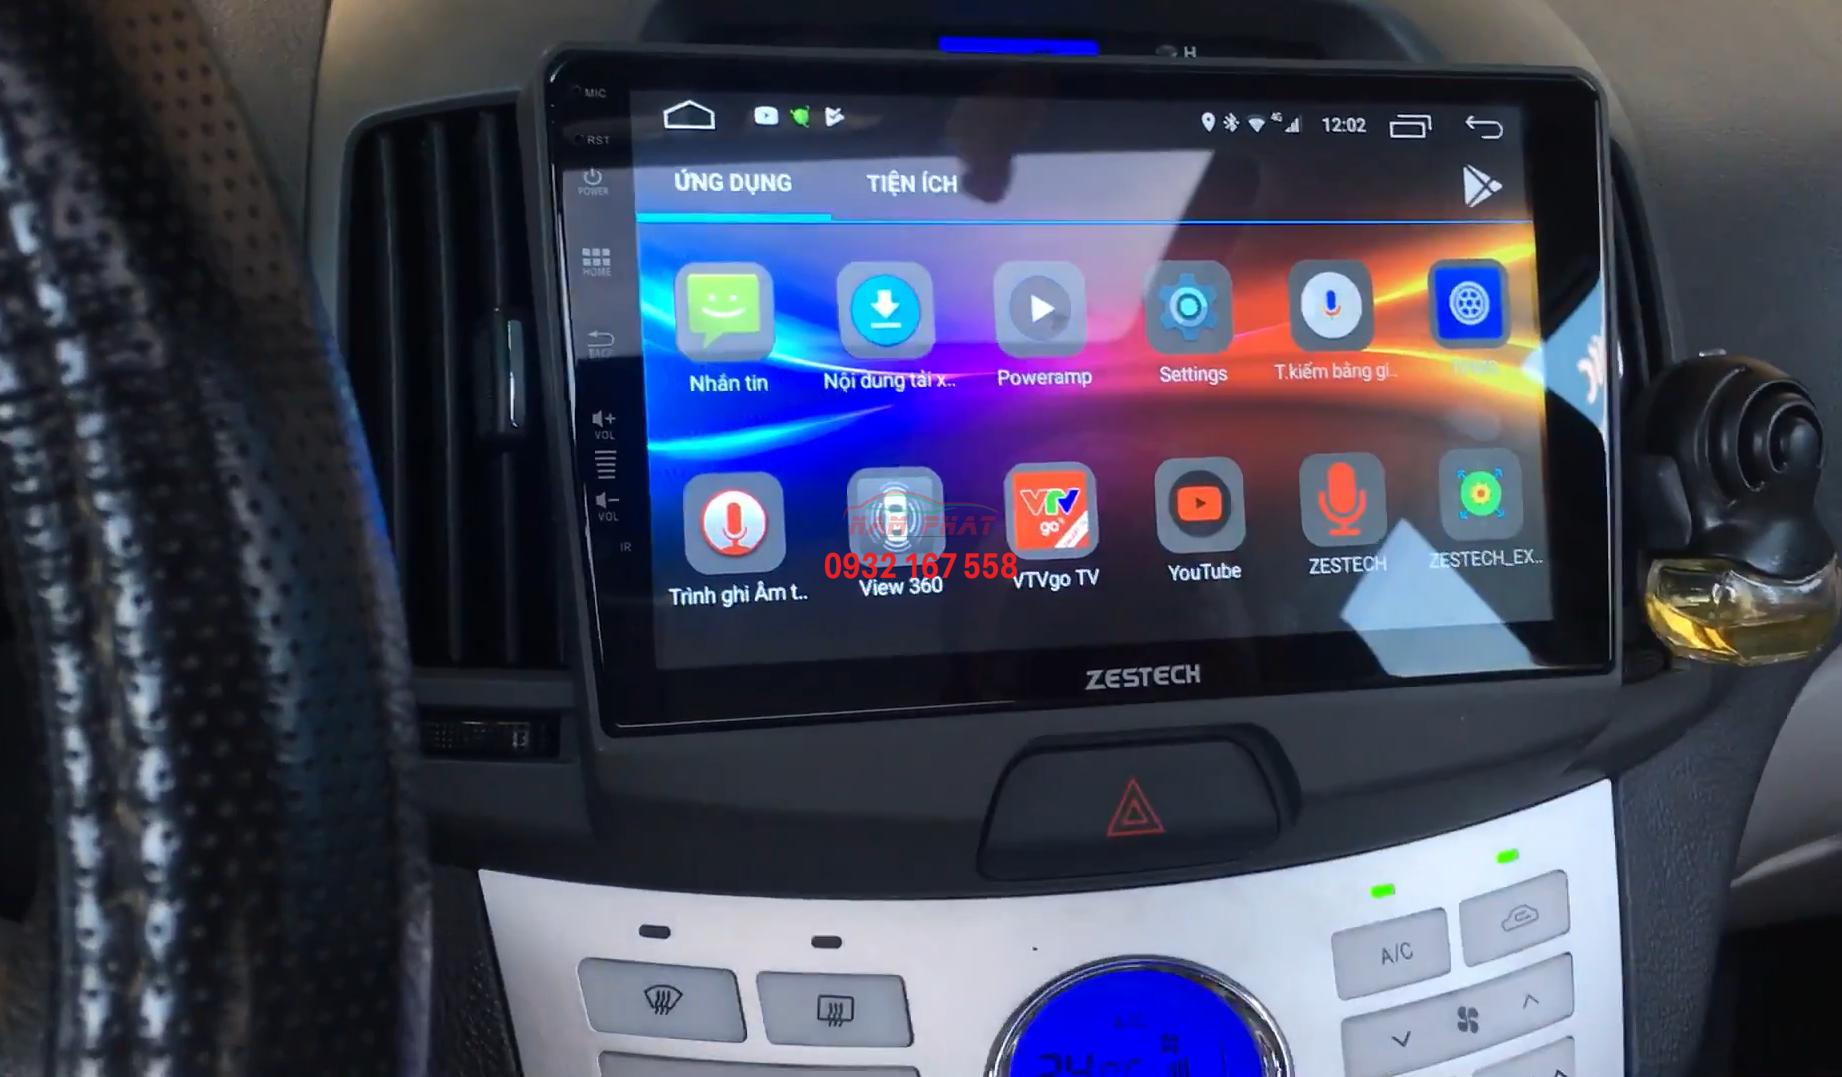 Lắp màn hình Android cho Hyundai Avante